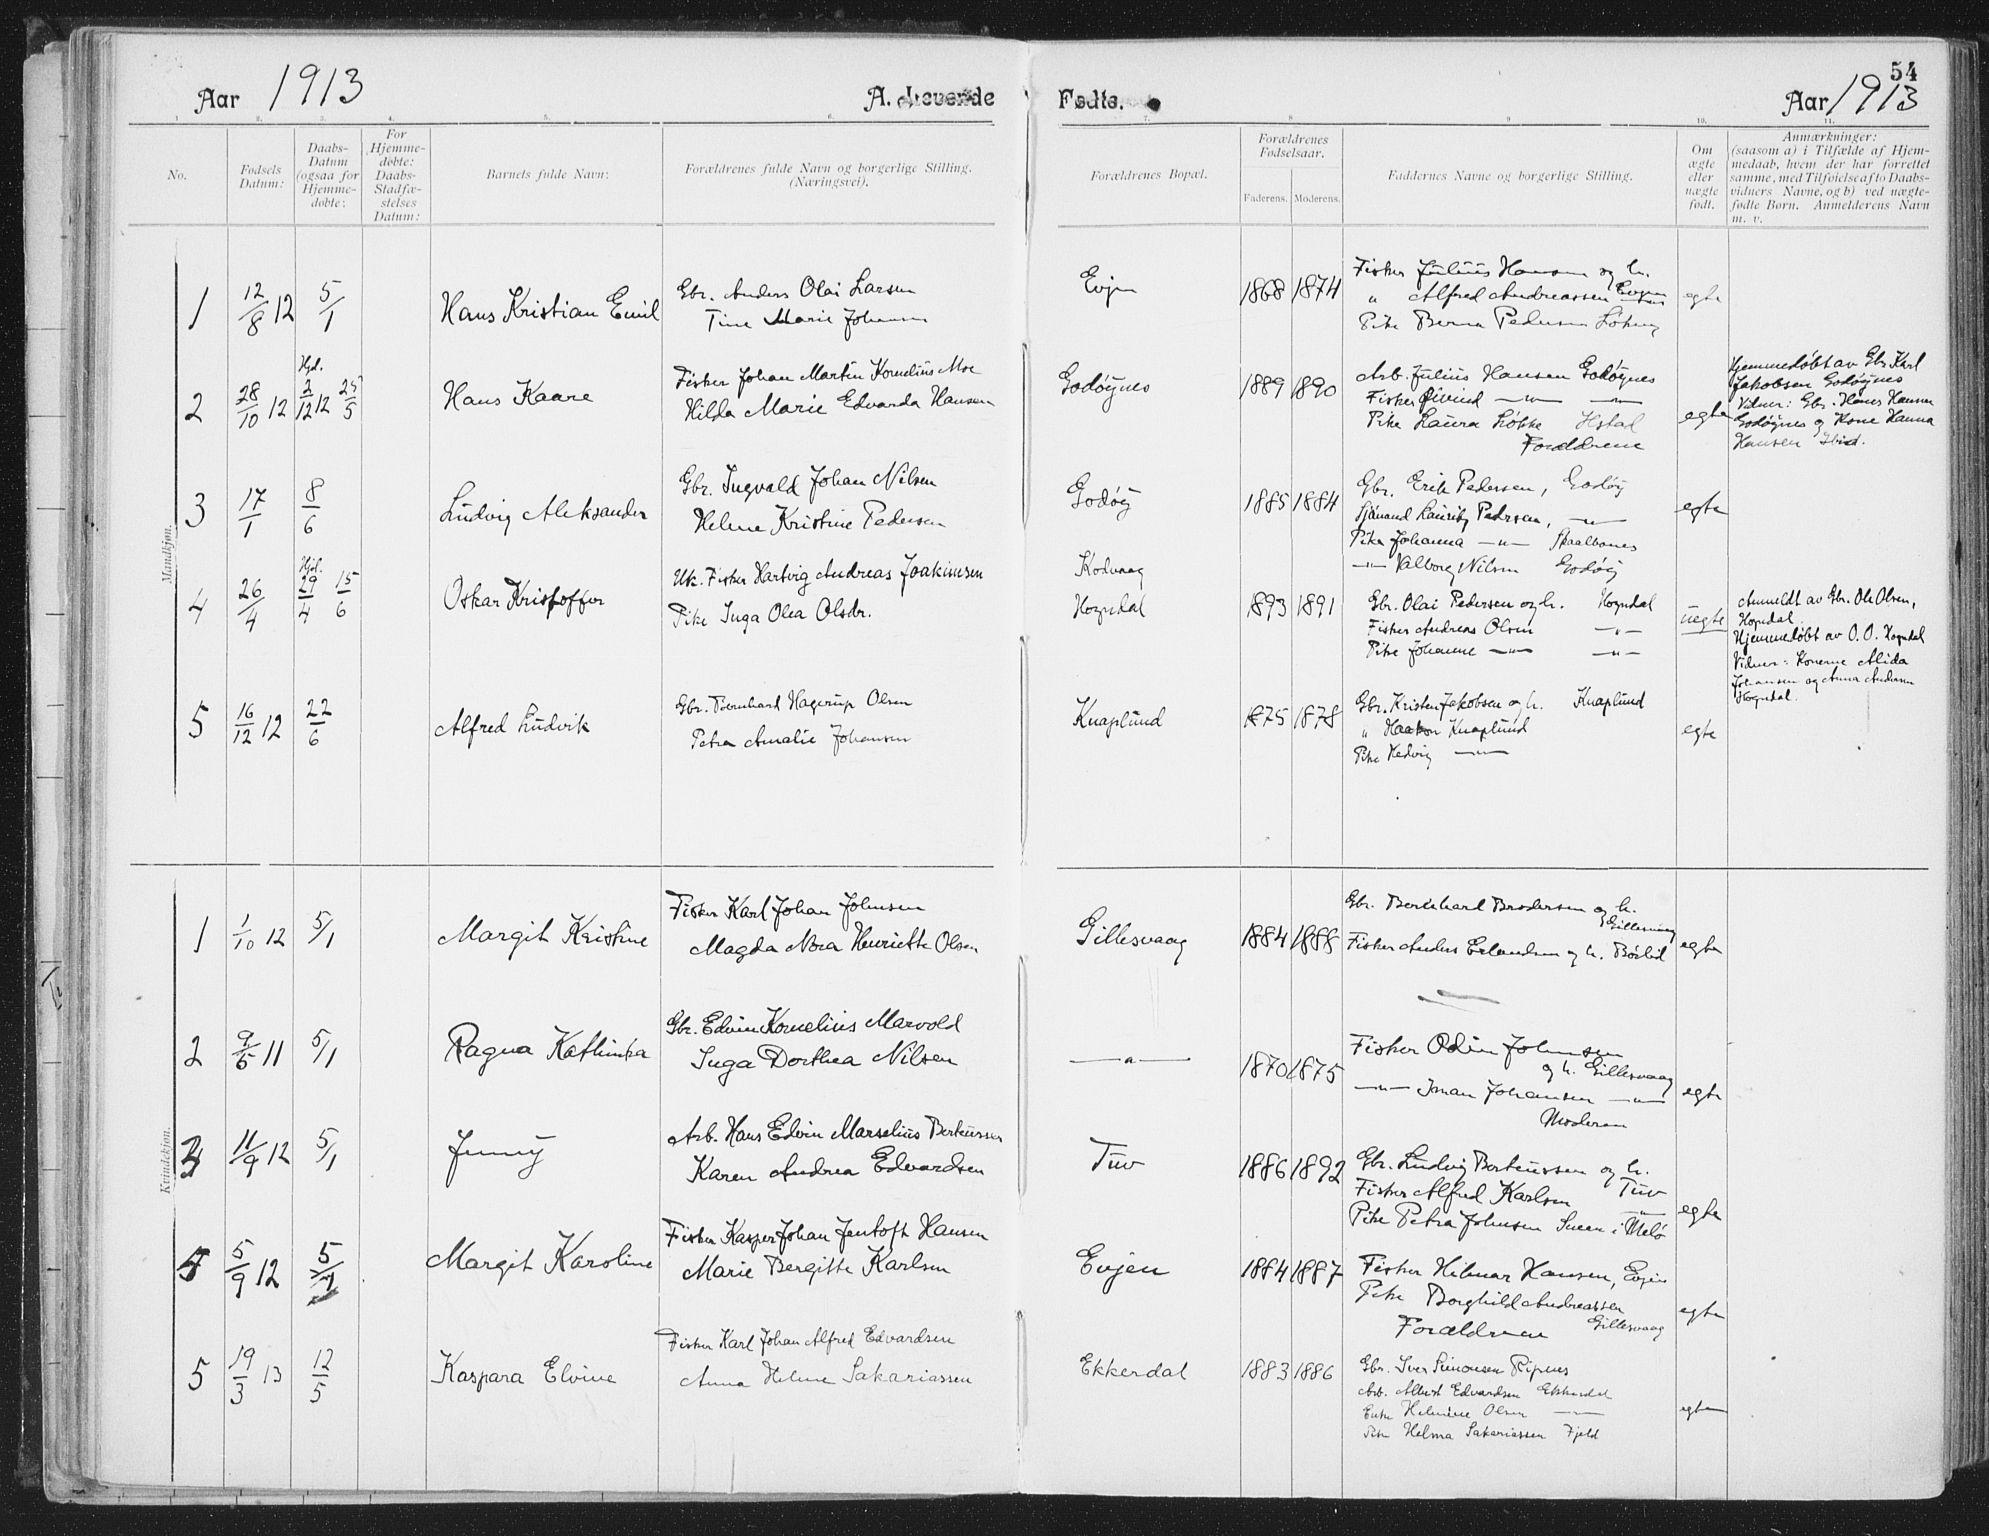 SAT, Ministerialprotokoller, klokkerbøker og fødselsregistre - Nordland, 804/L0081: Ministerialbok nr. 804A02, 1901-1915, s. 54